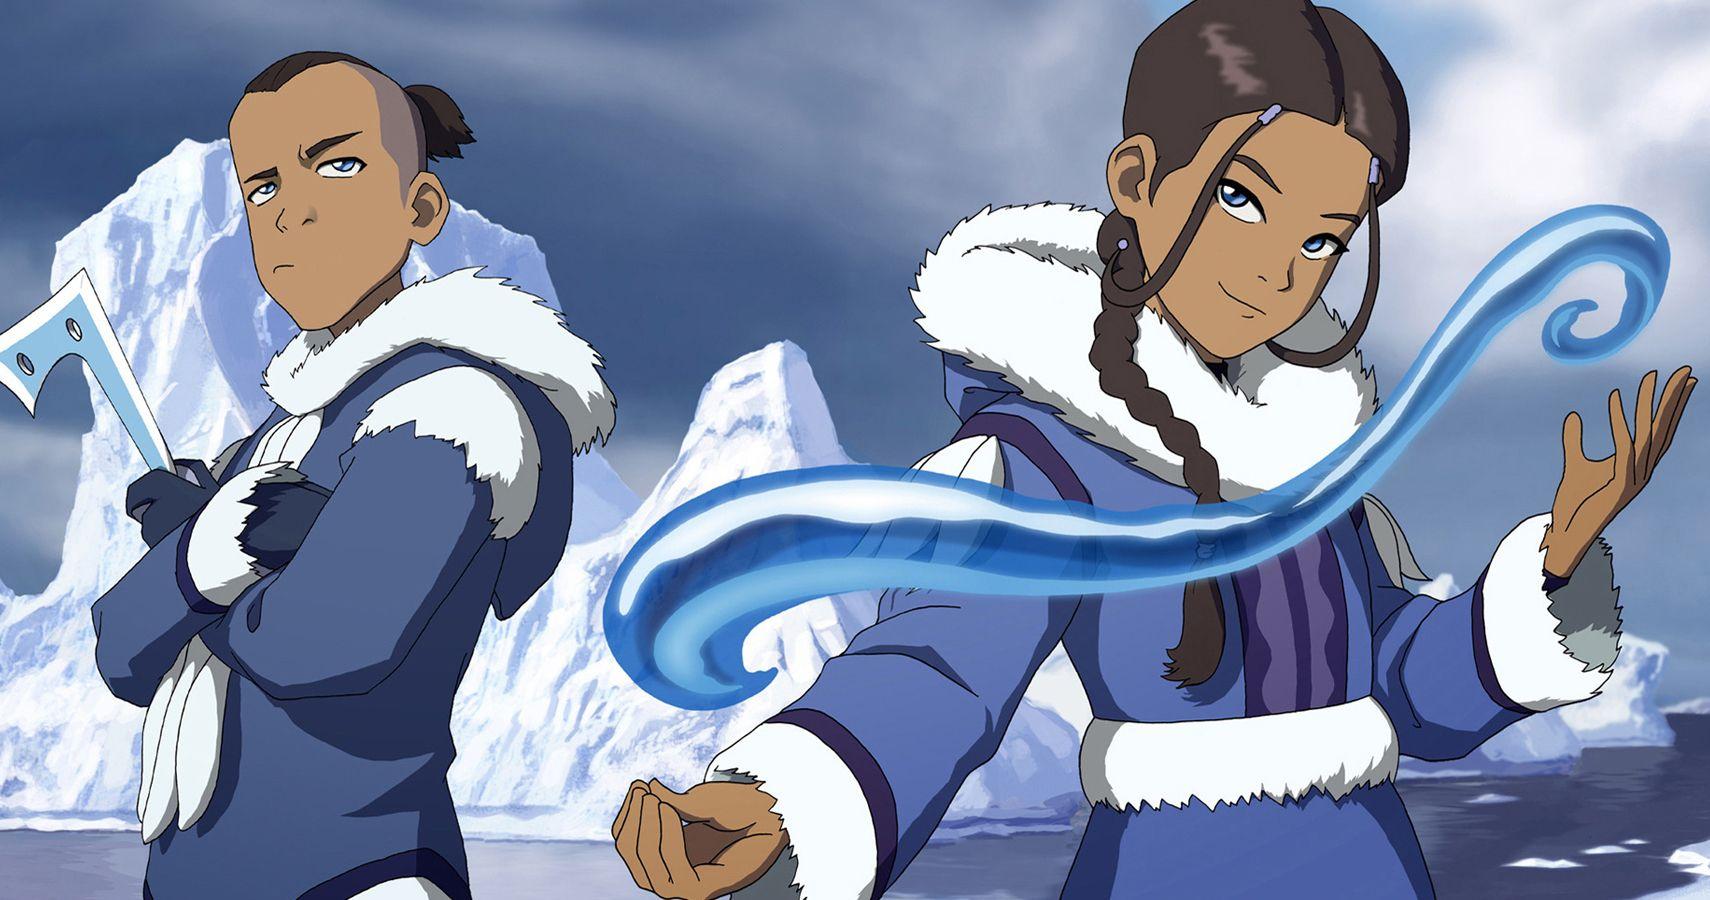 25 Things About Katara That Make No Sense In Avatar: The Last Airbender